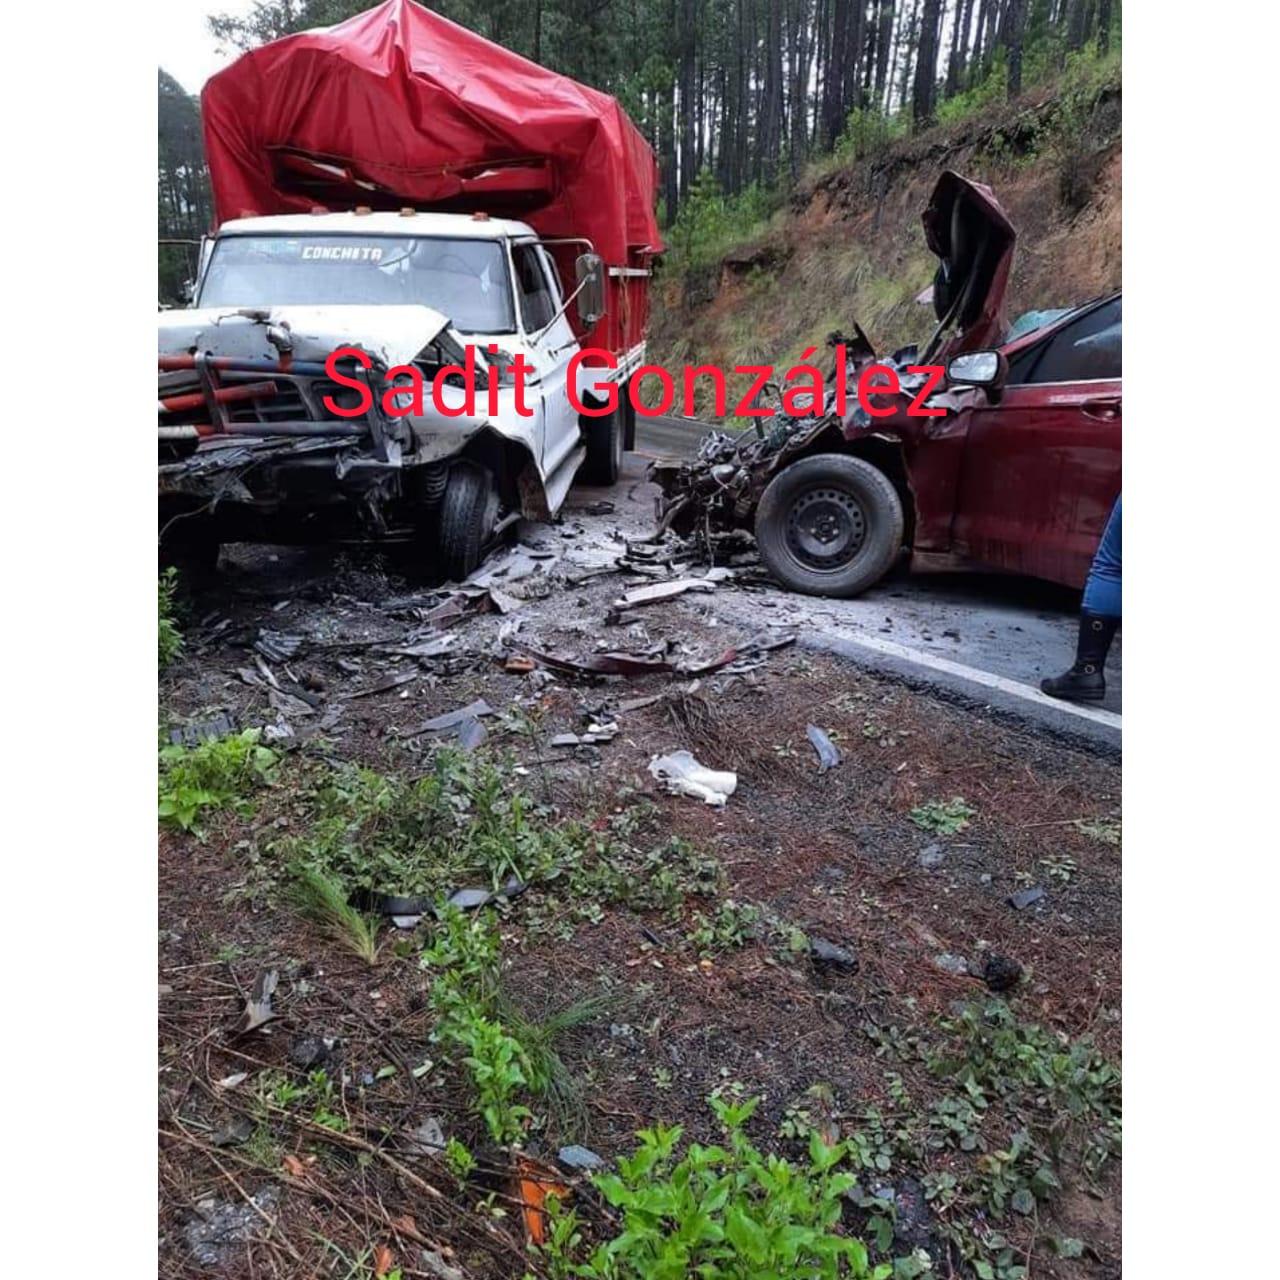 Fuerte accidente en la carretera federal Chignahuapan-Aquixtla cobra la vida de una persona